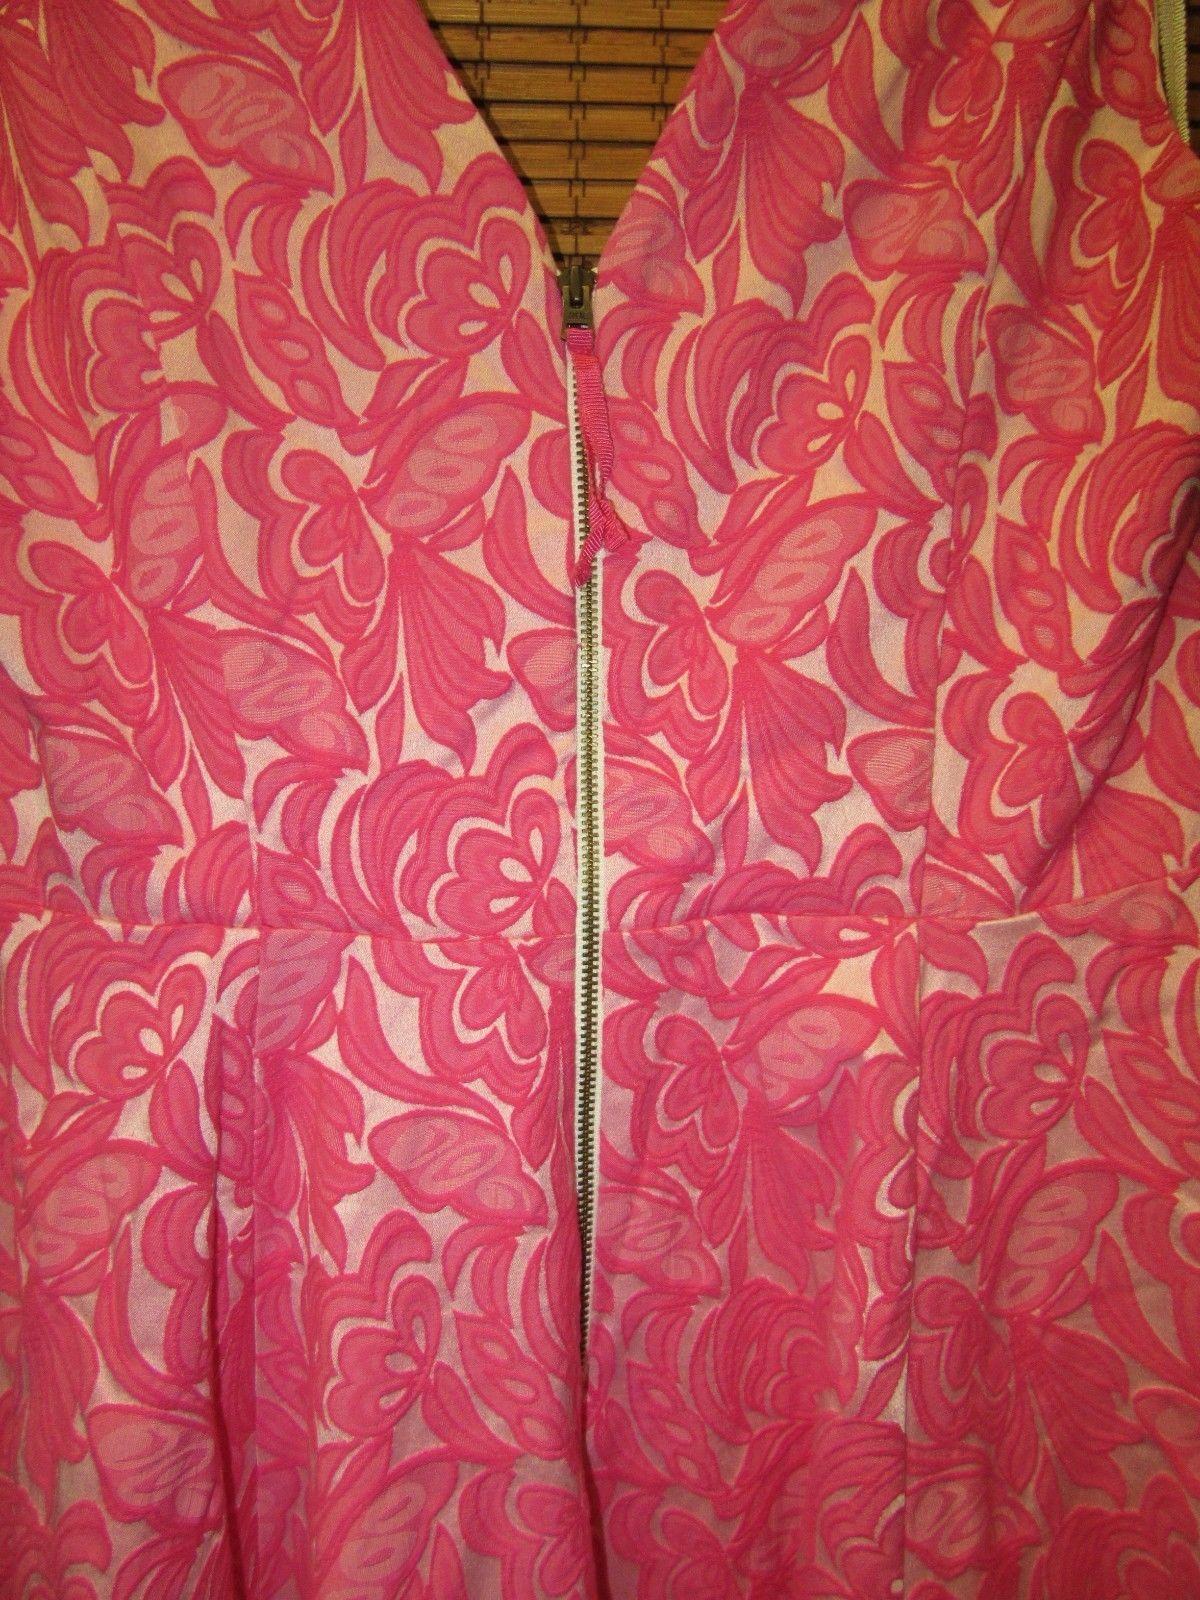 New Anthropologie Maeve  Swing Jacquard Pink Floral V-Neck Dress Sizes: 6  &  12